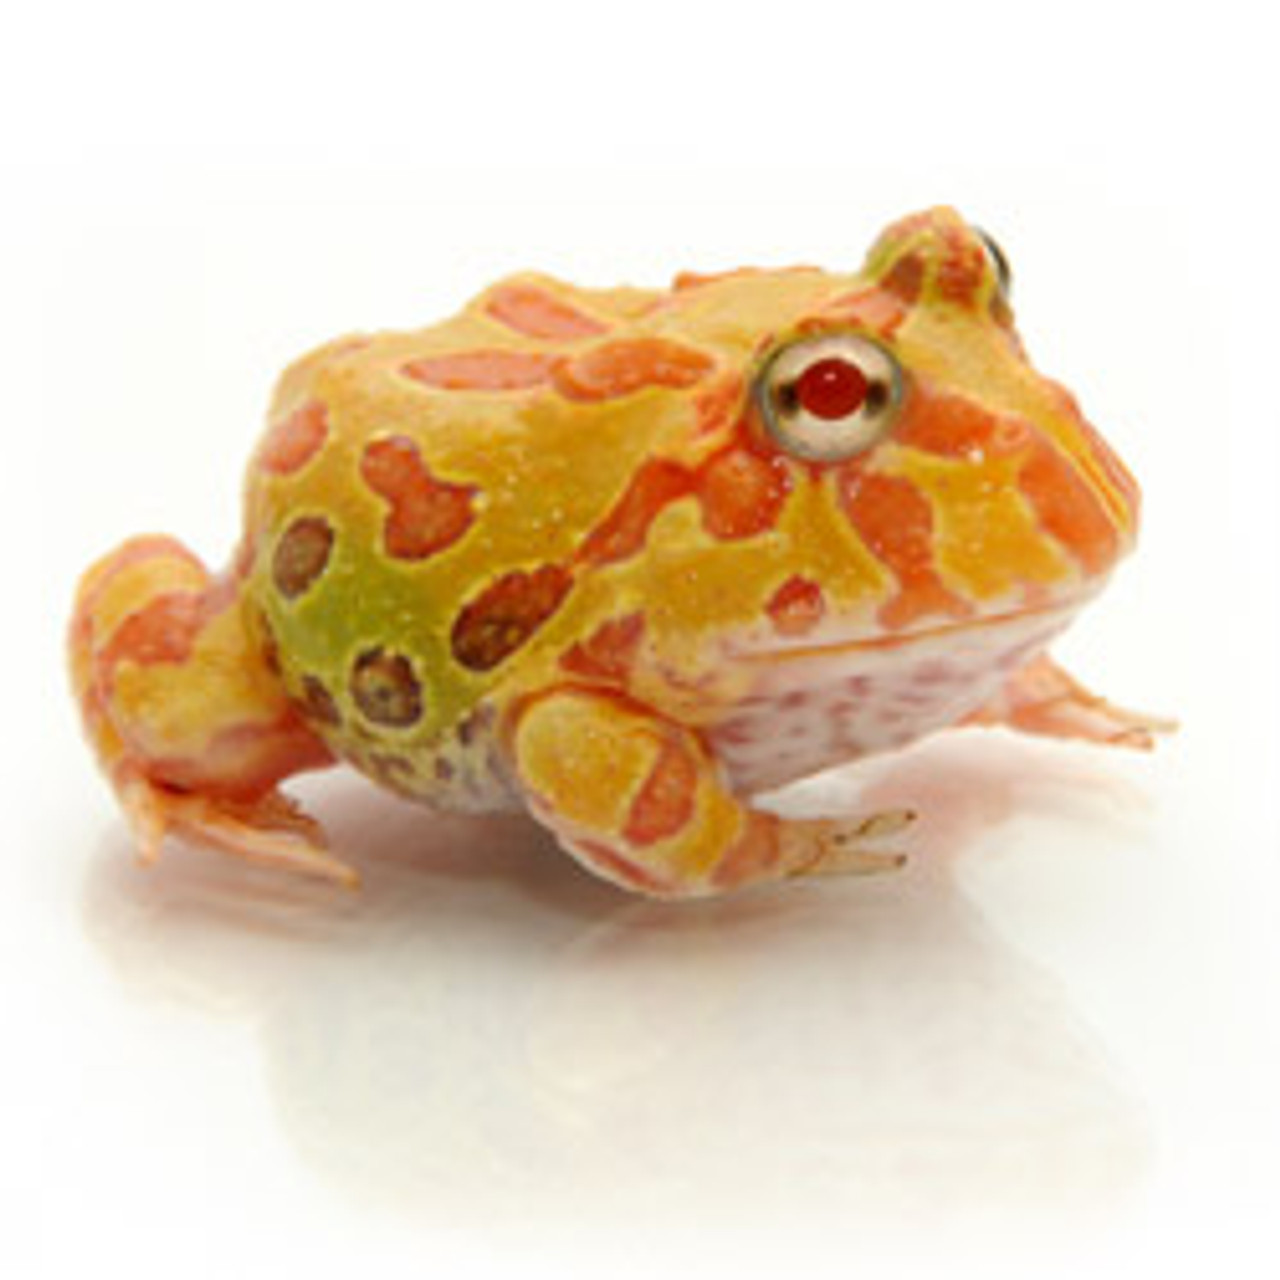 Albino PacMan Frog (Ceratopryhs cranwelli)